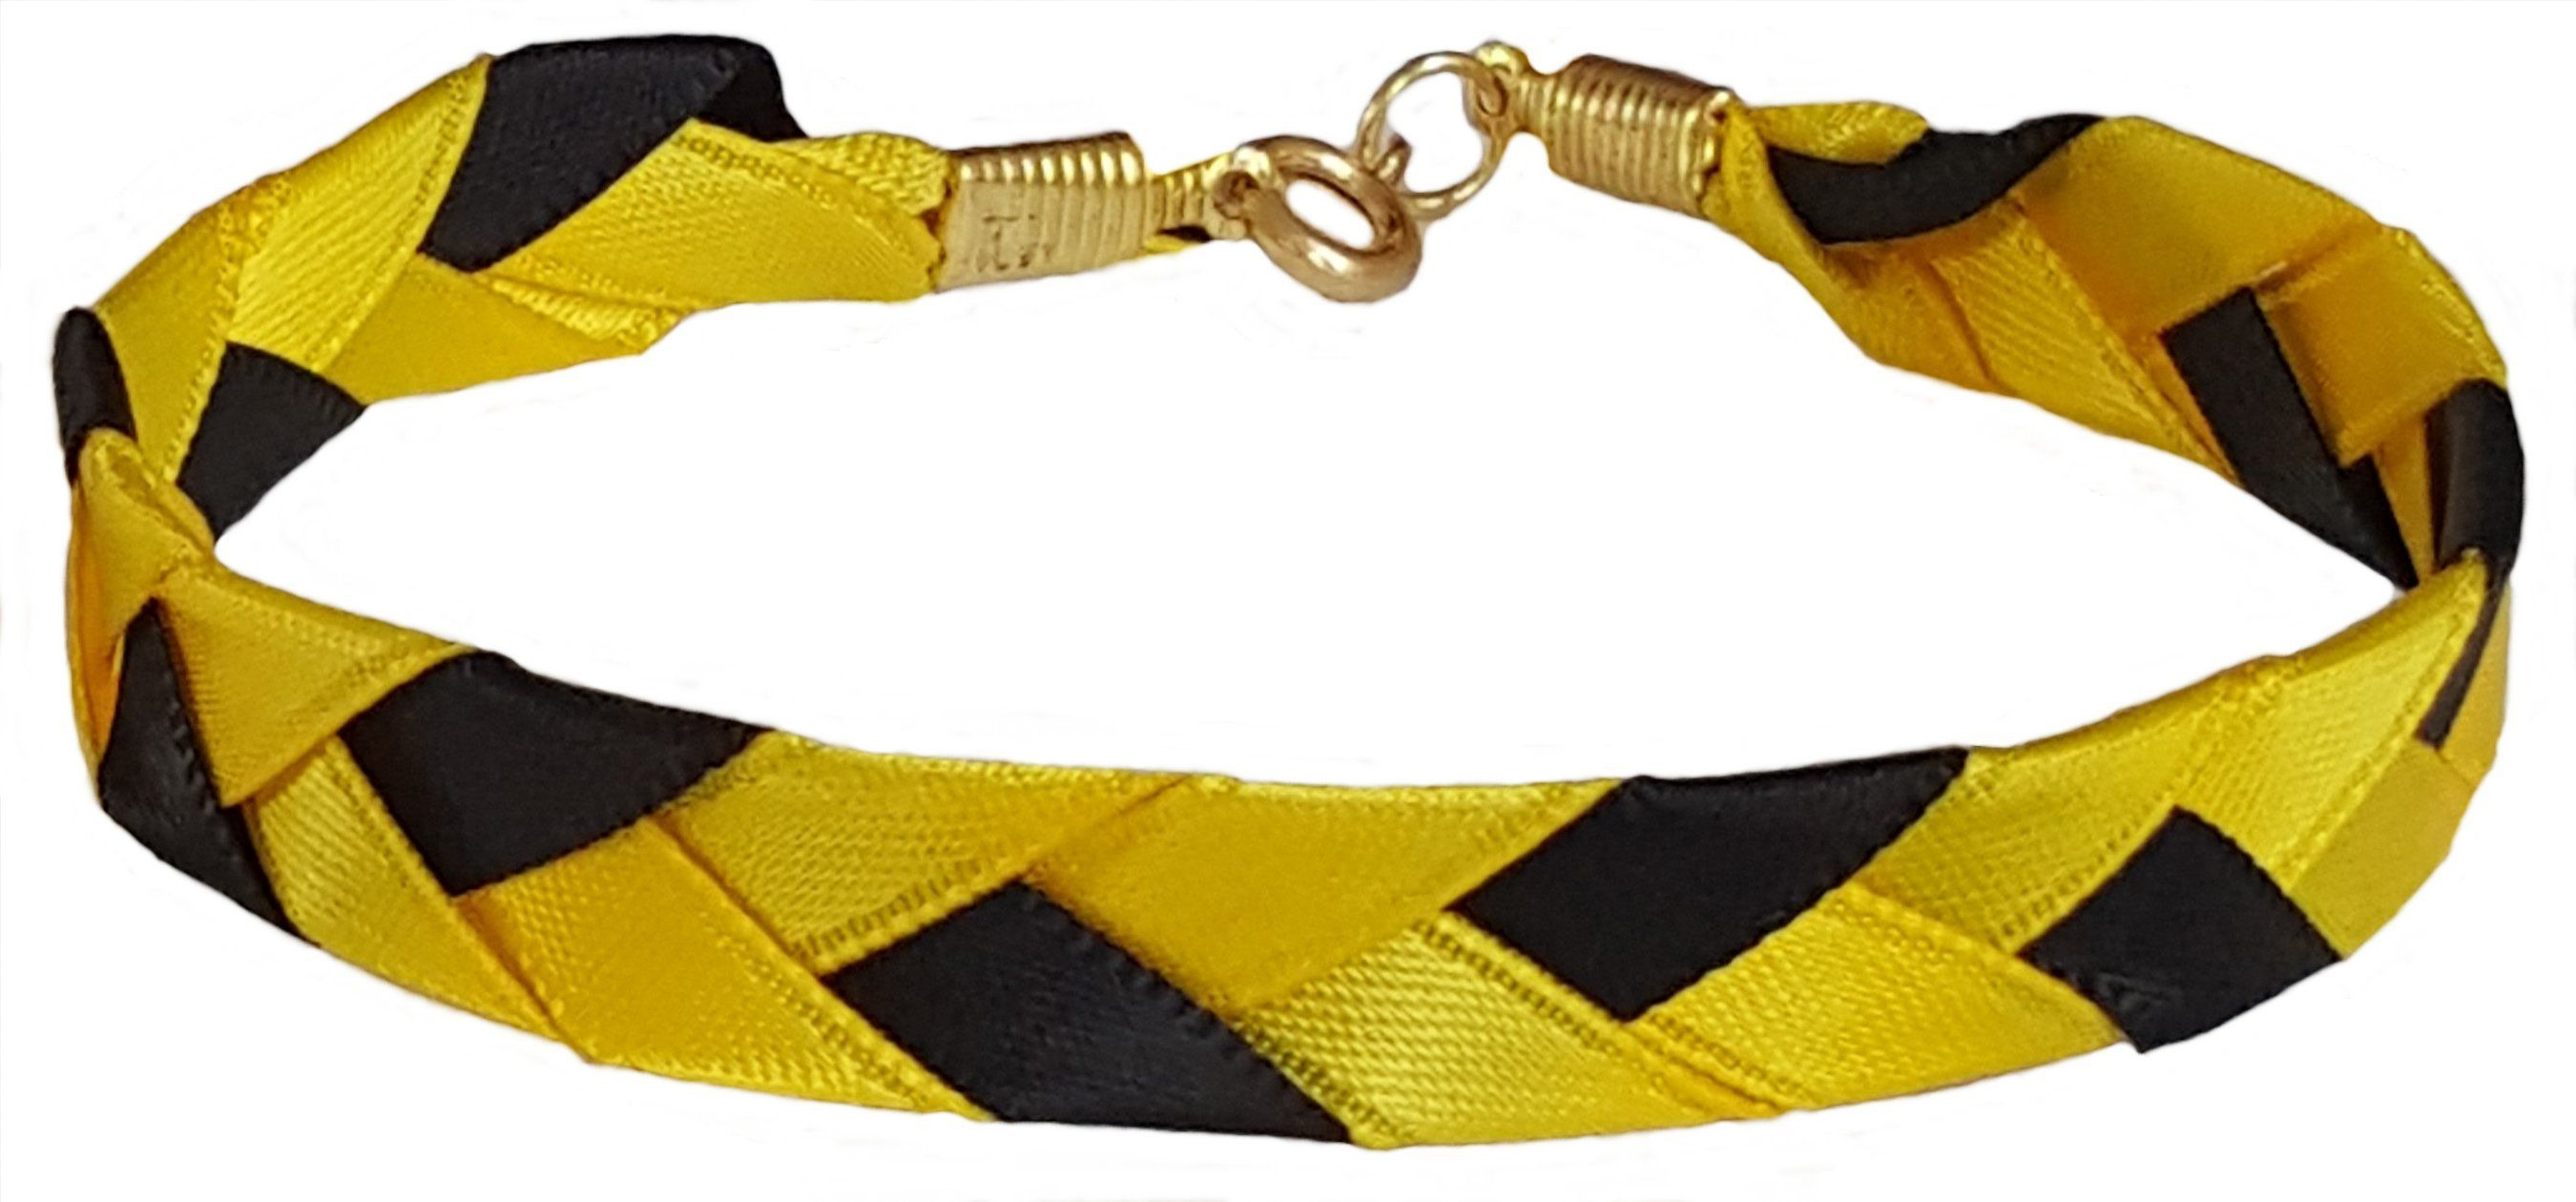 Ribbon Criss Cross Bracelets